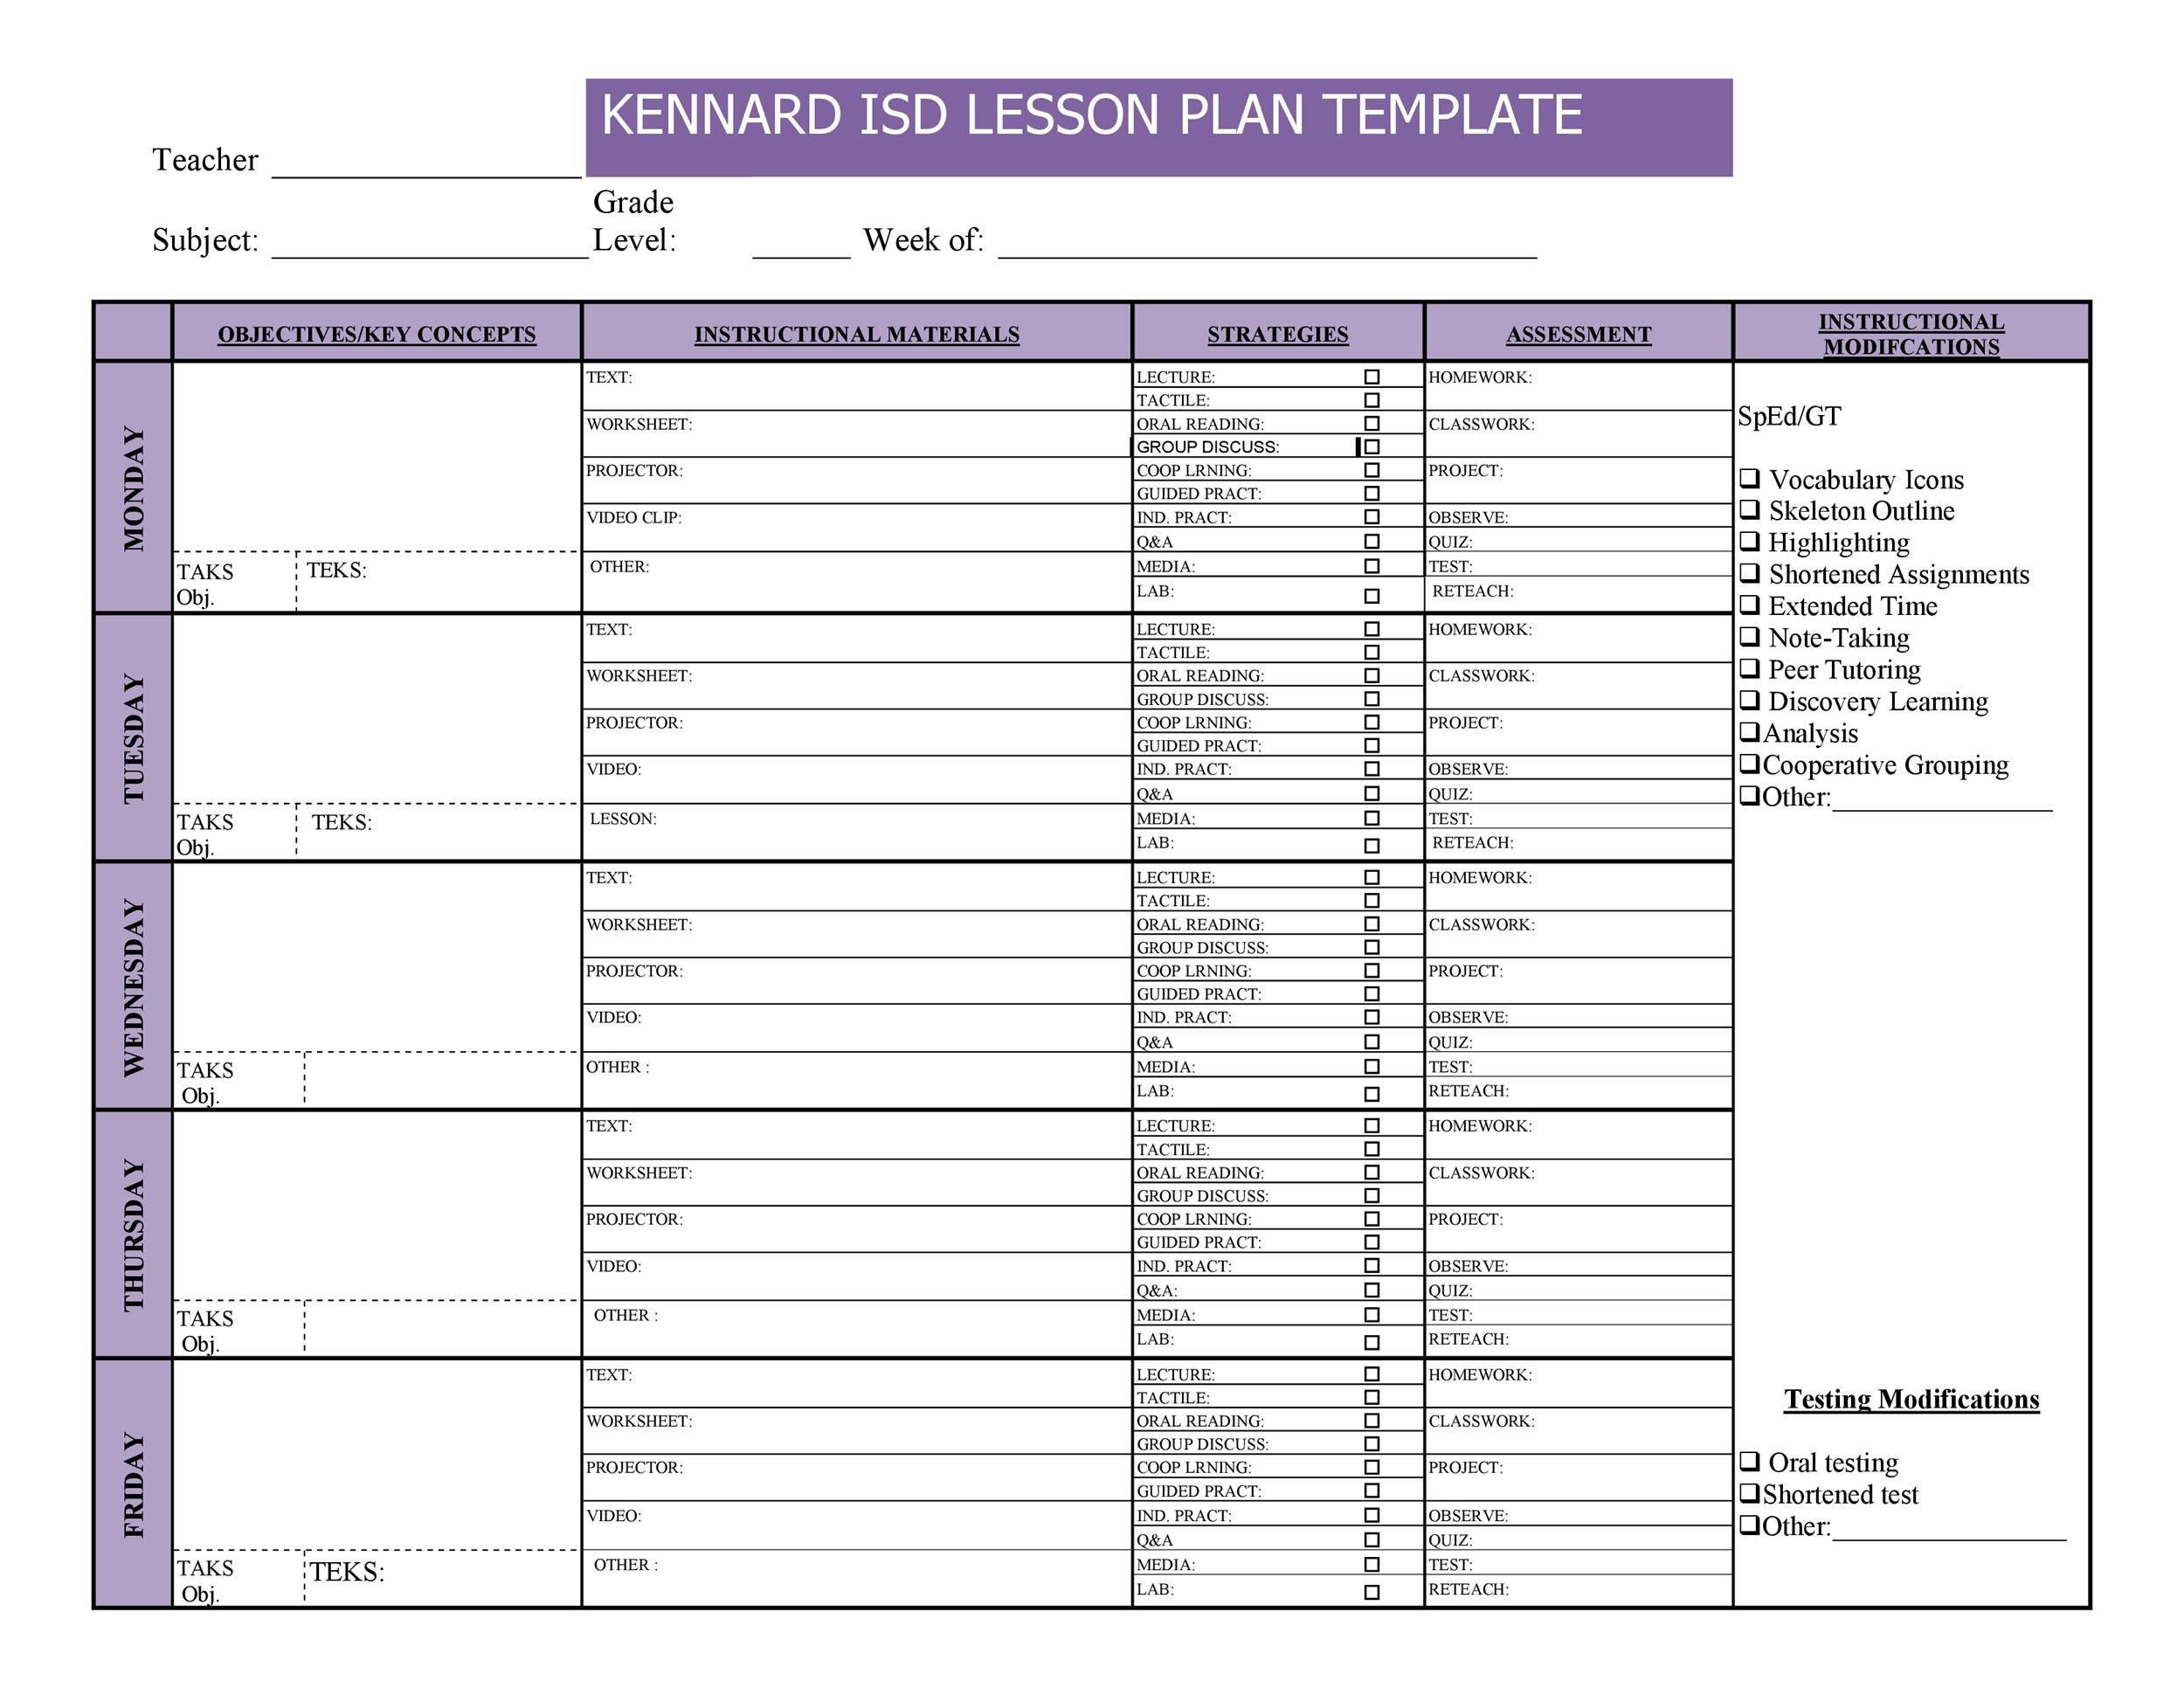 005 Stupendou Weekly Lesson Plan Template Editable High Resolution  Google Doc Preschool Downloadable FreeFull